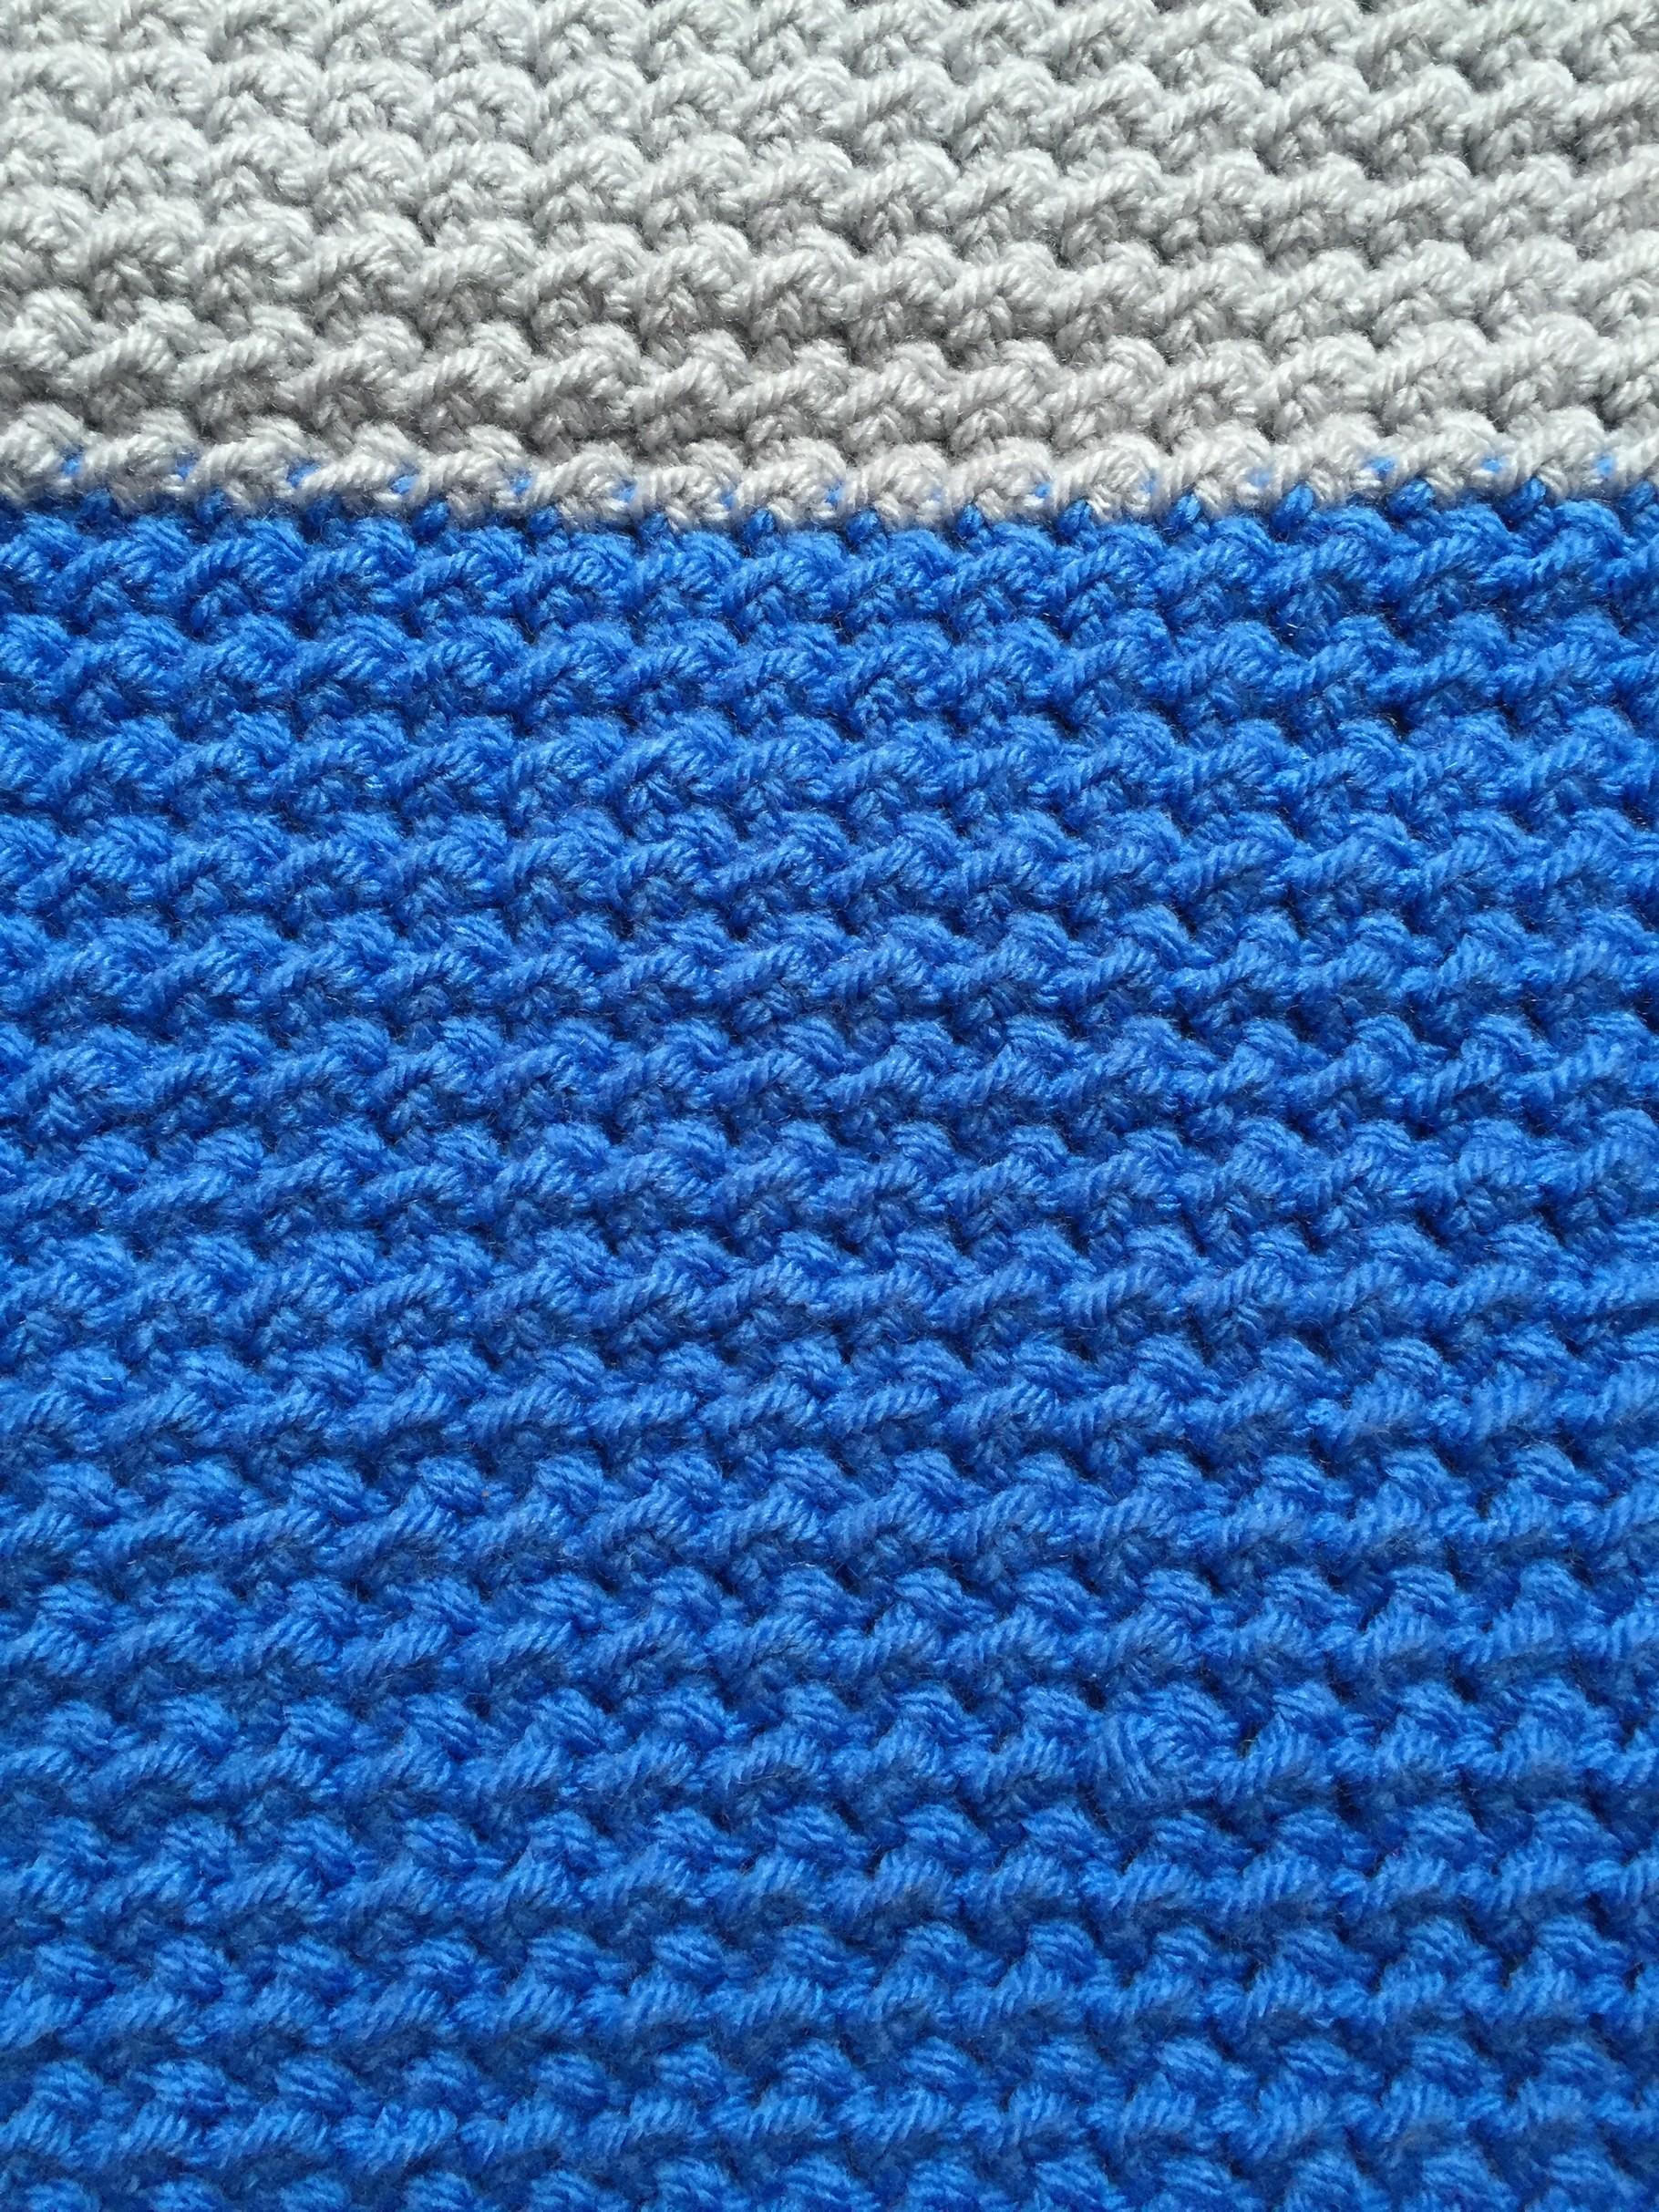 Crochet Headband With Flower Pattern